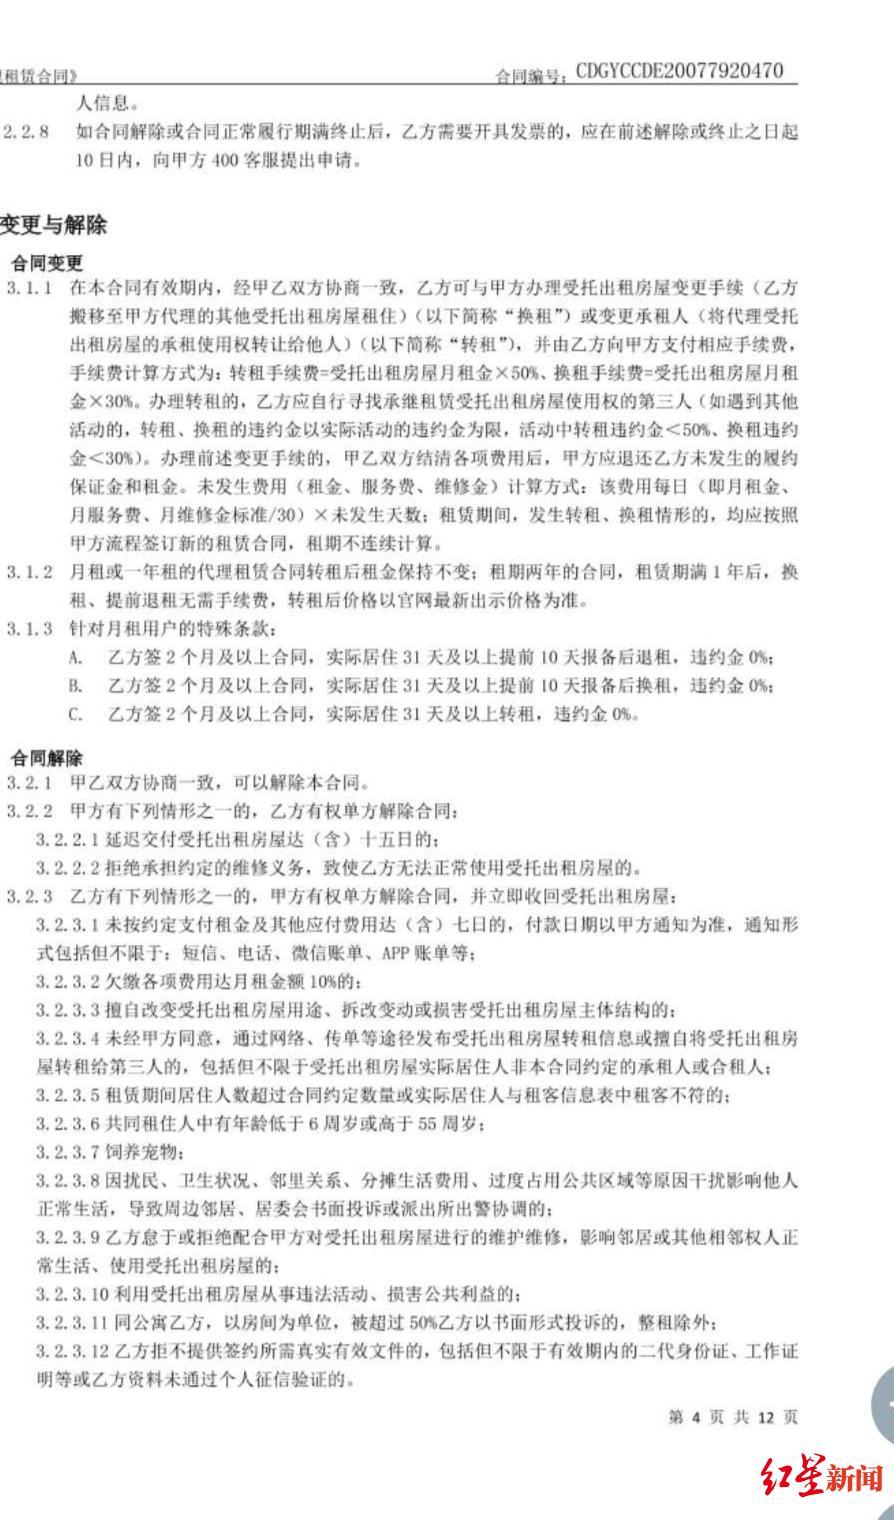 IMG_6463(20200712-220737).JPG